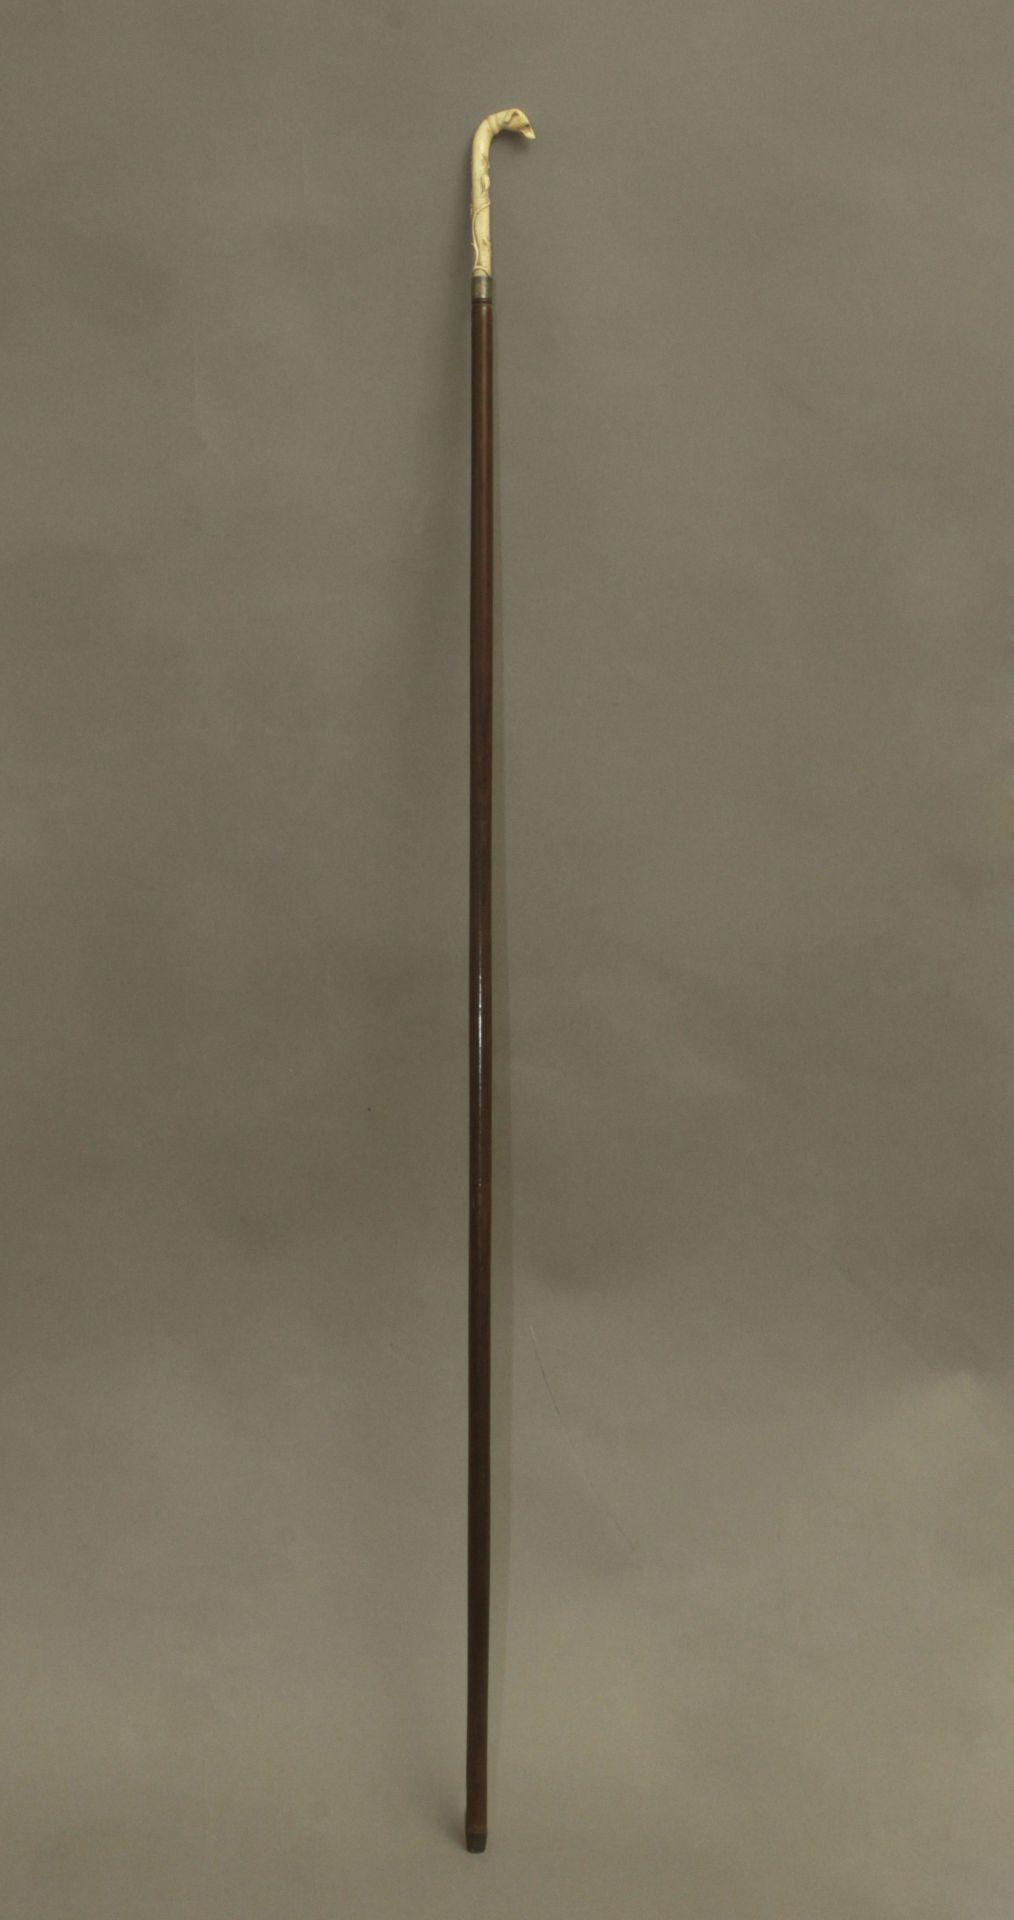 A 19th century probably English walking stick - Bild 3 aus 11